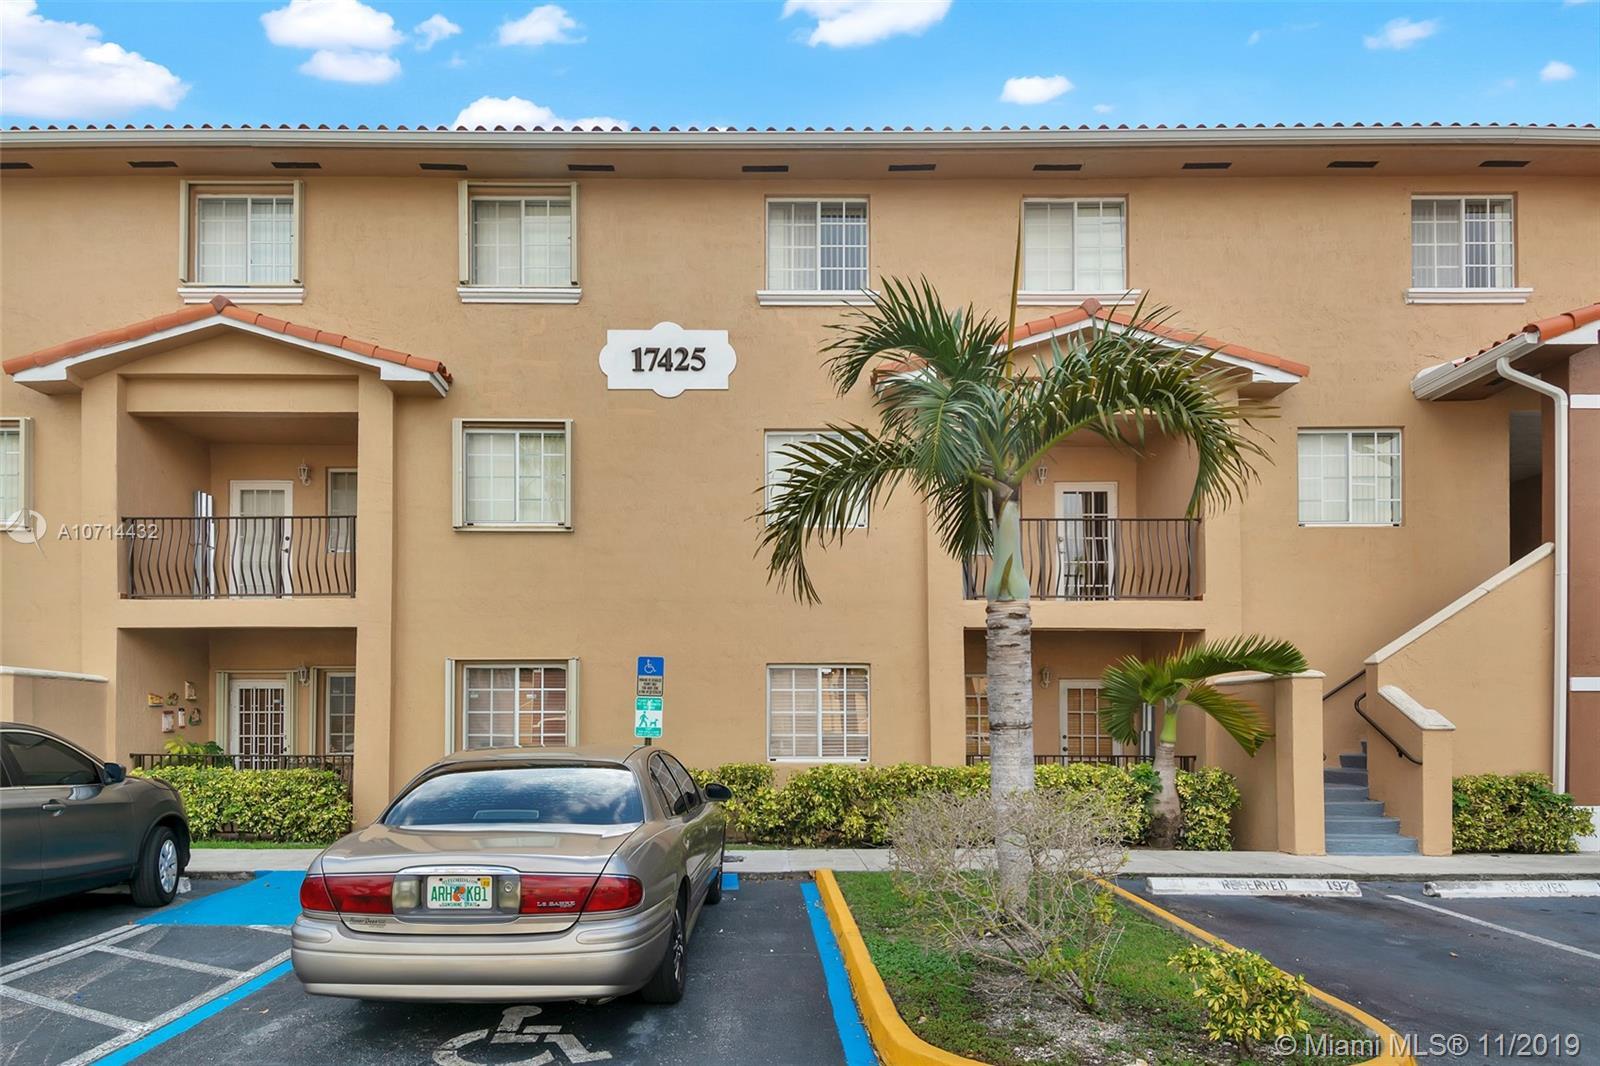 17425 NW 75th Pl #106, Hialeah, FL 33015 - Hialeah, FL real estate listing